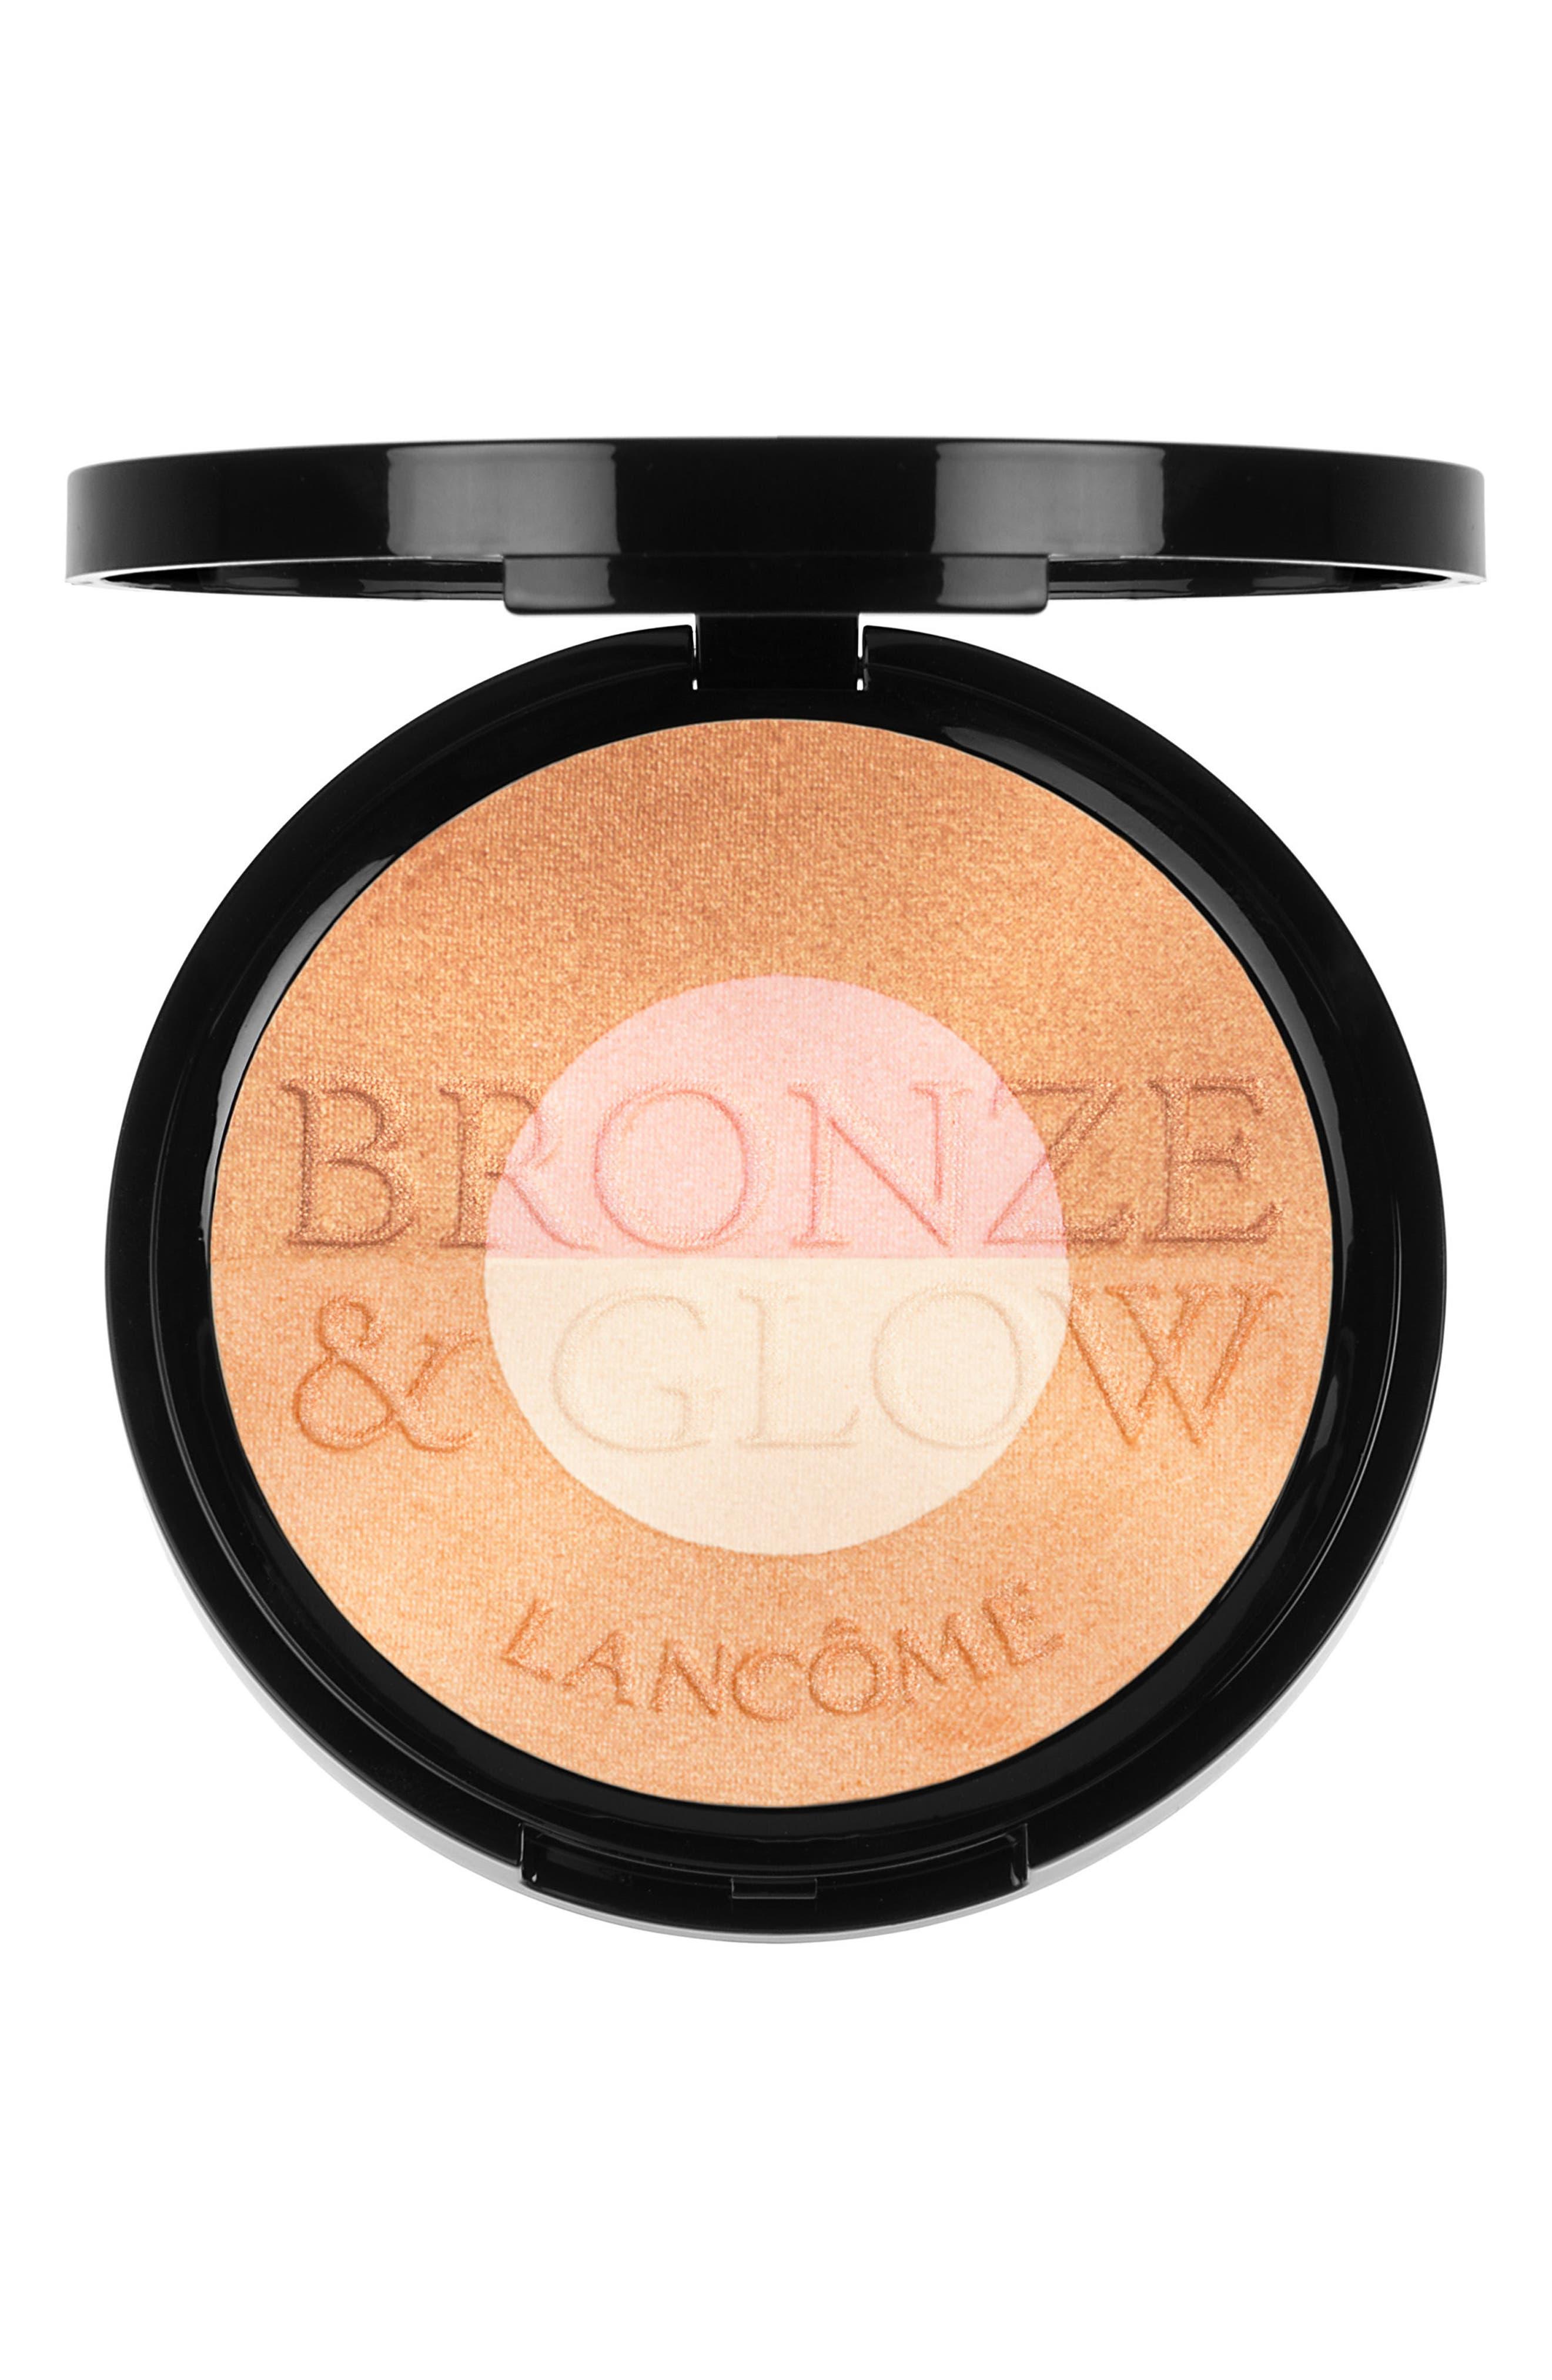 Lancôme Bronze & Glow Powder